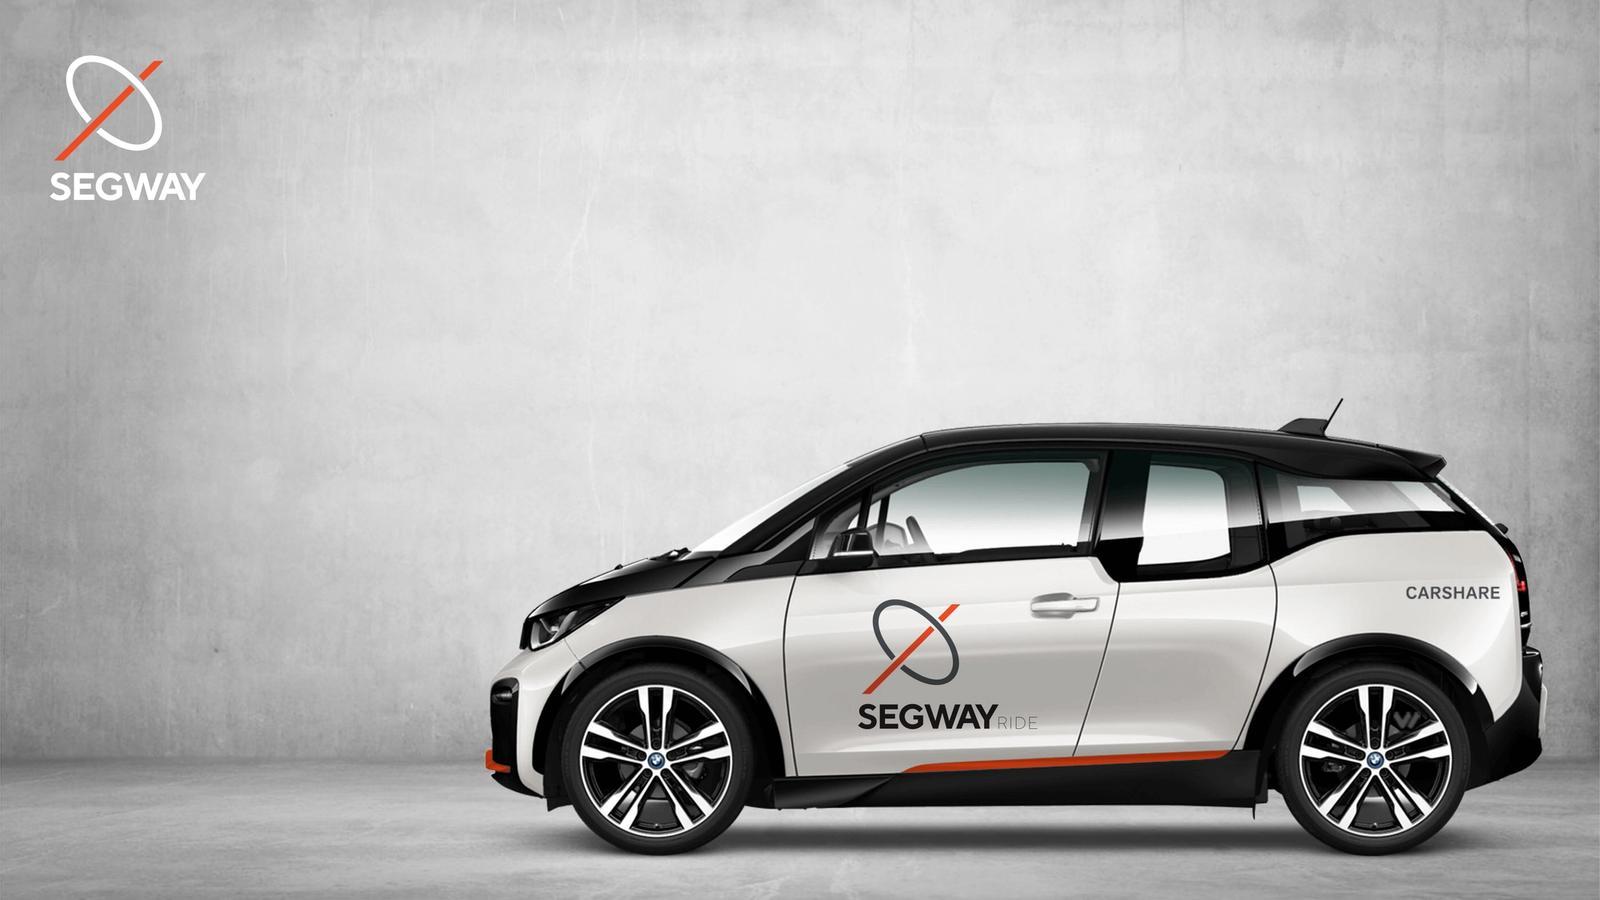 Segway Rebrand // Carshare Service